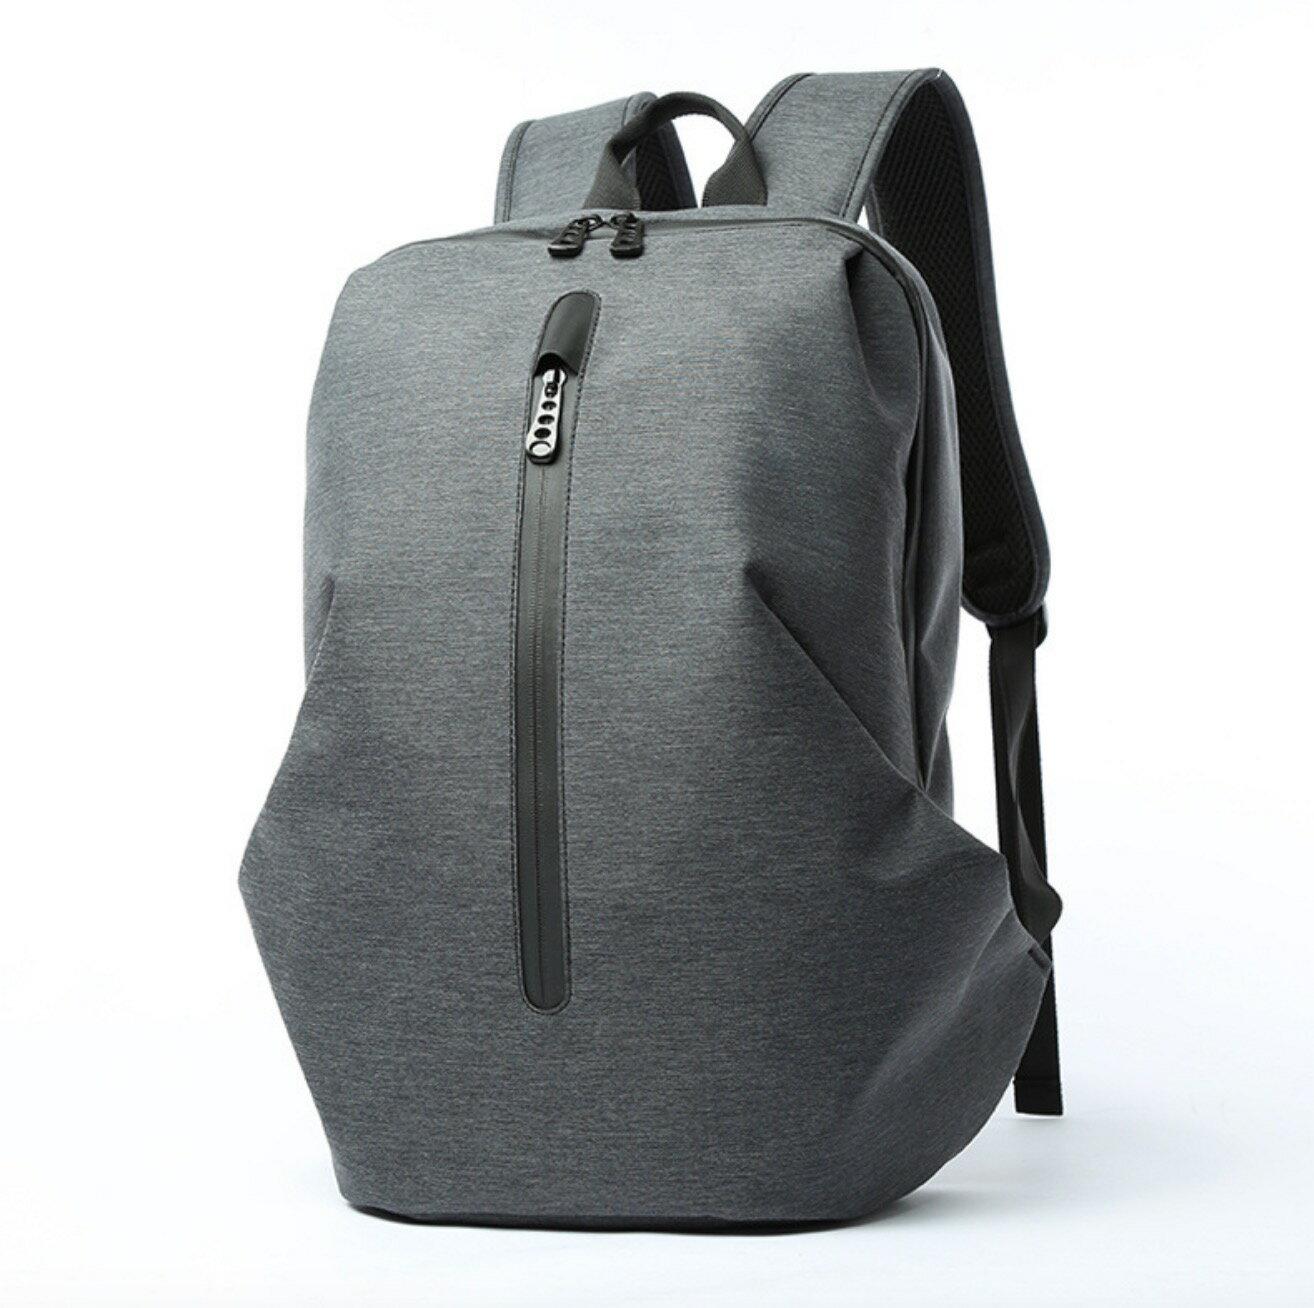 LINAGI里奈子 【YP18-6690】韓 後背包 雙背包 運動包 電腦包 上班 學生